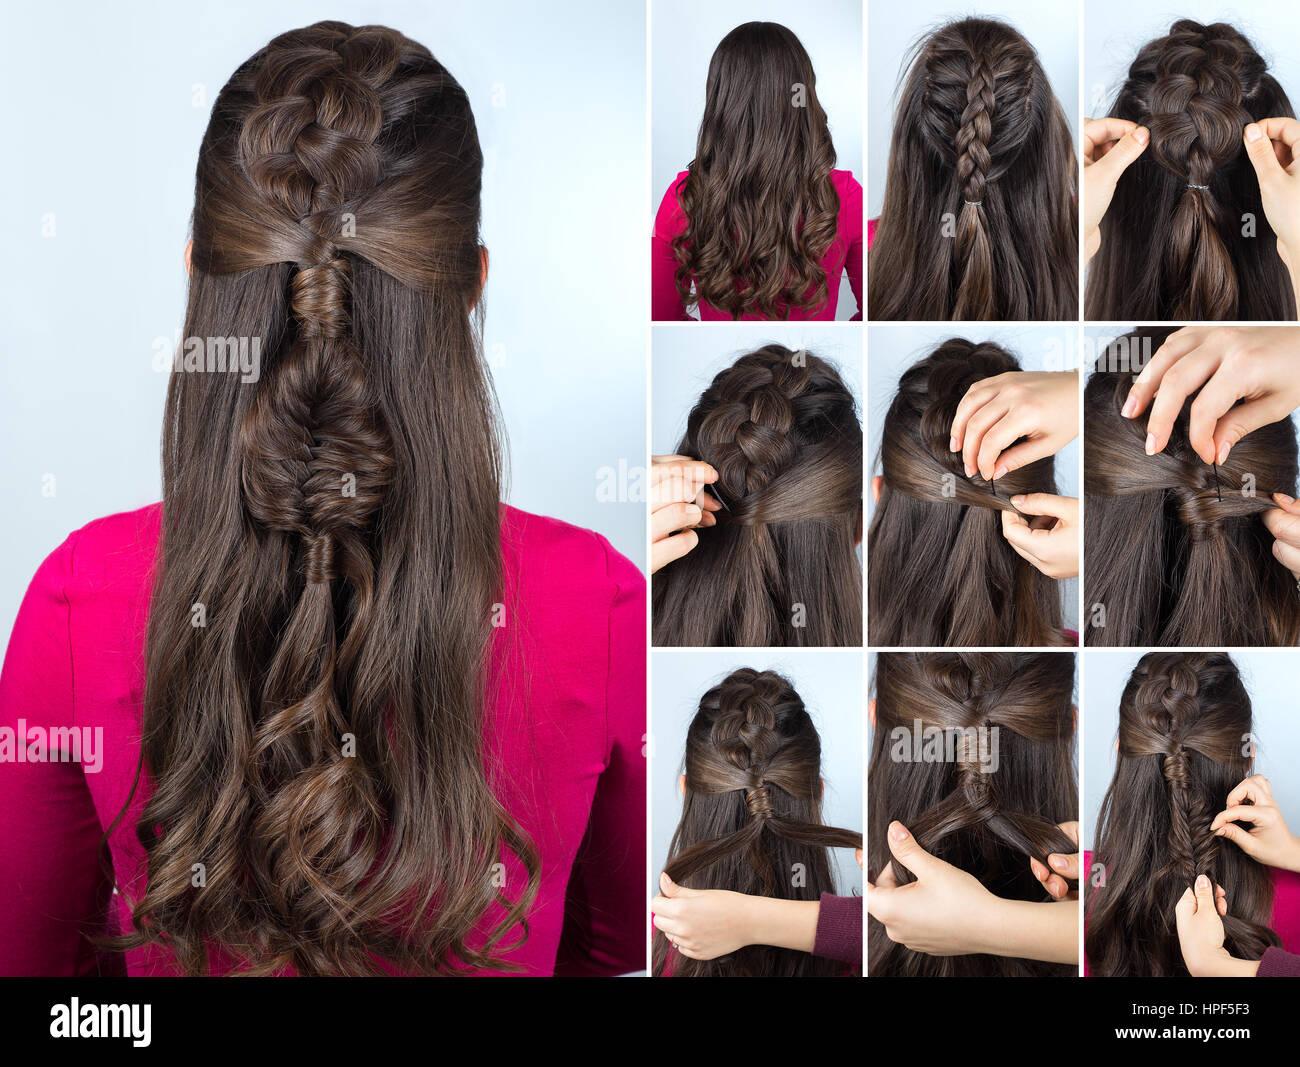 Moderno Peinado Con Trenza Boho Rizado El Pelo Suelto Tutorial De